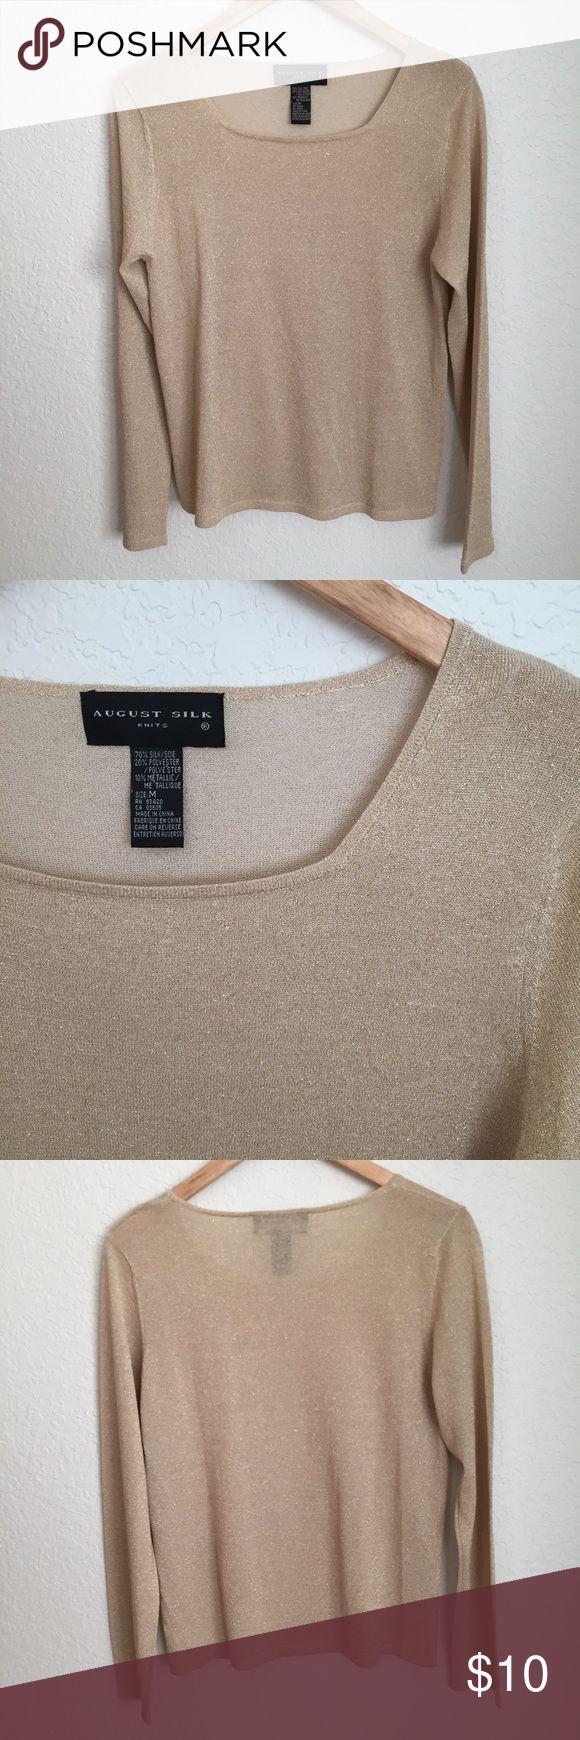 August Silk shimmery long sleeve top Pretty shimmery gold long sleeve top from August Silk. 70% silk, 20% polyester, 10% metallic. august silk Tops Tees - Long Sleeve